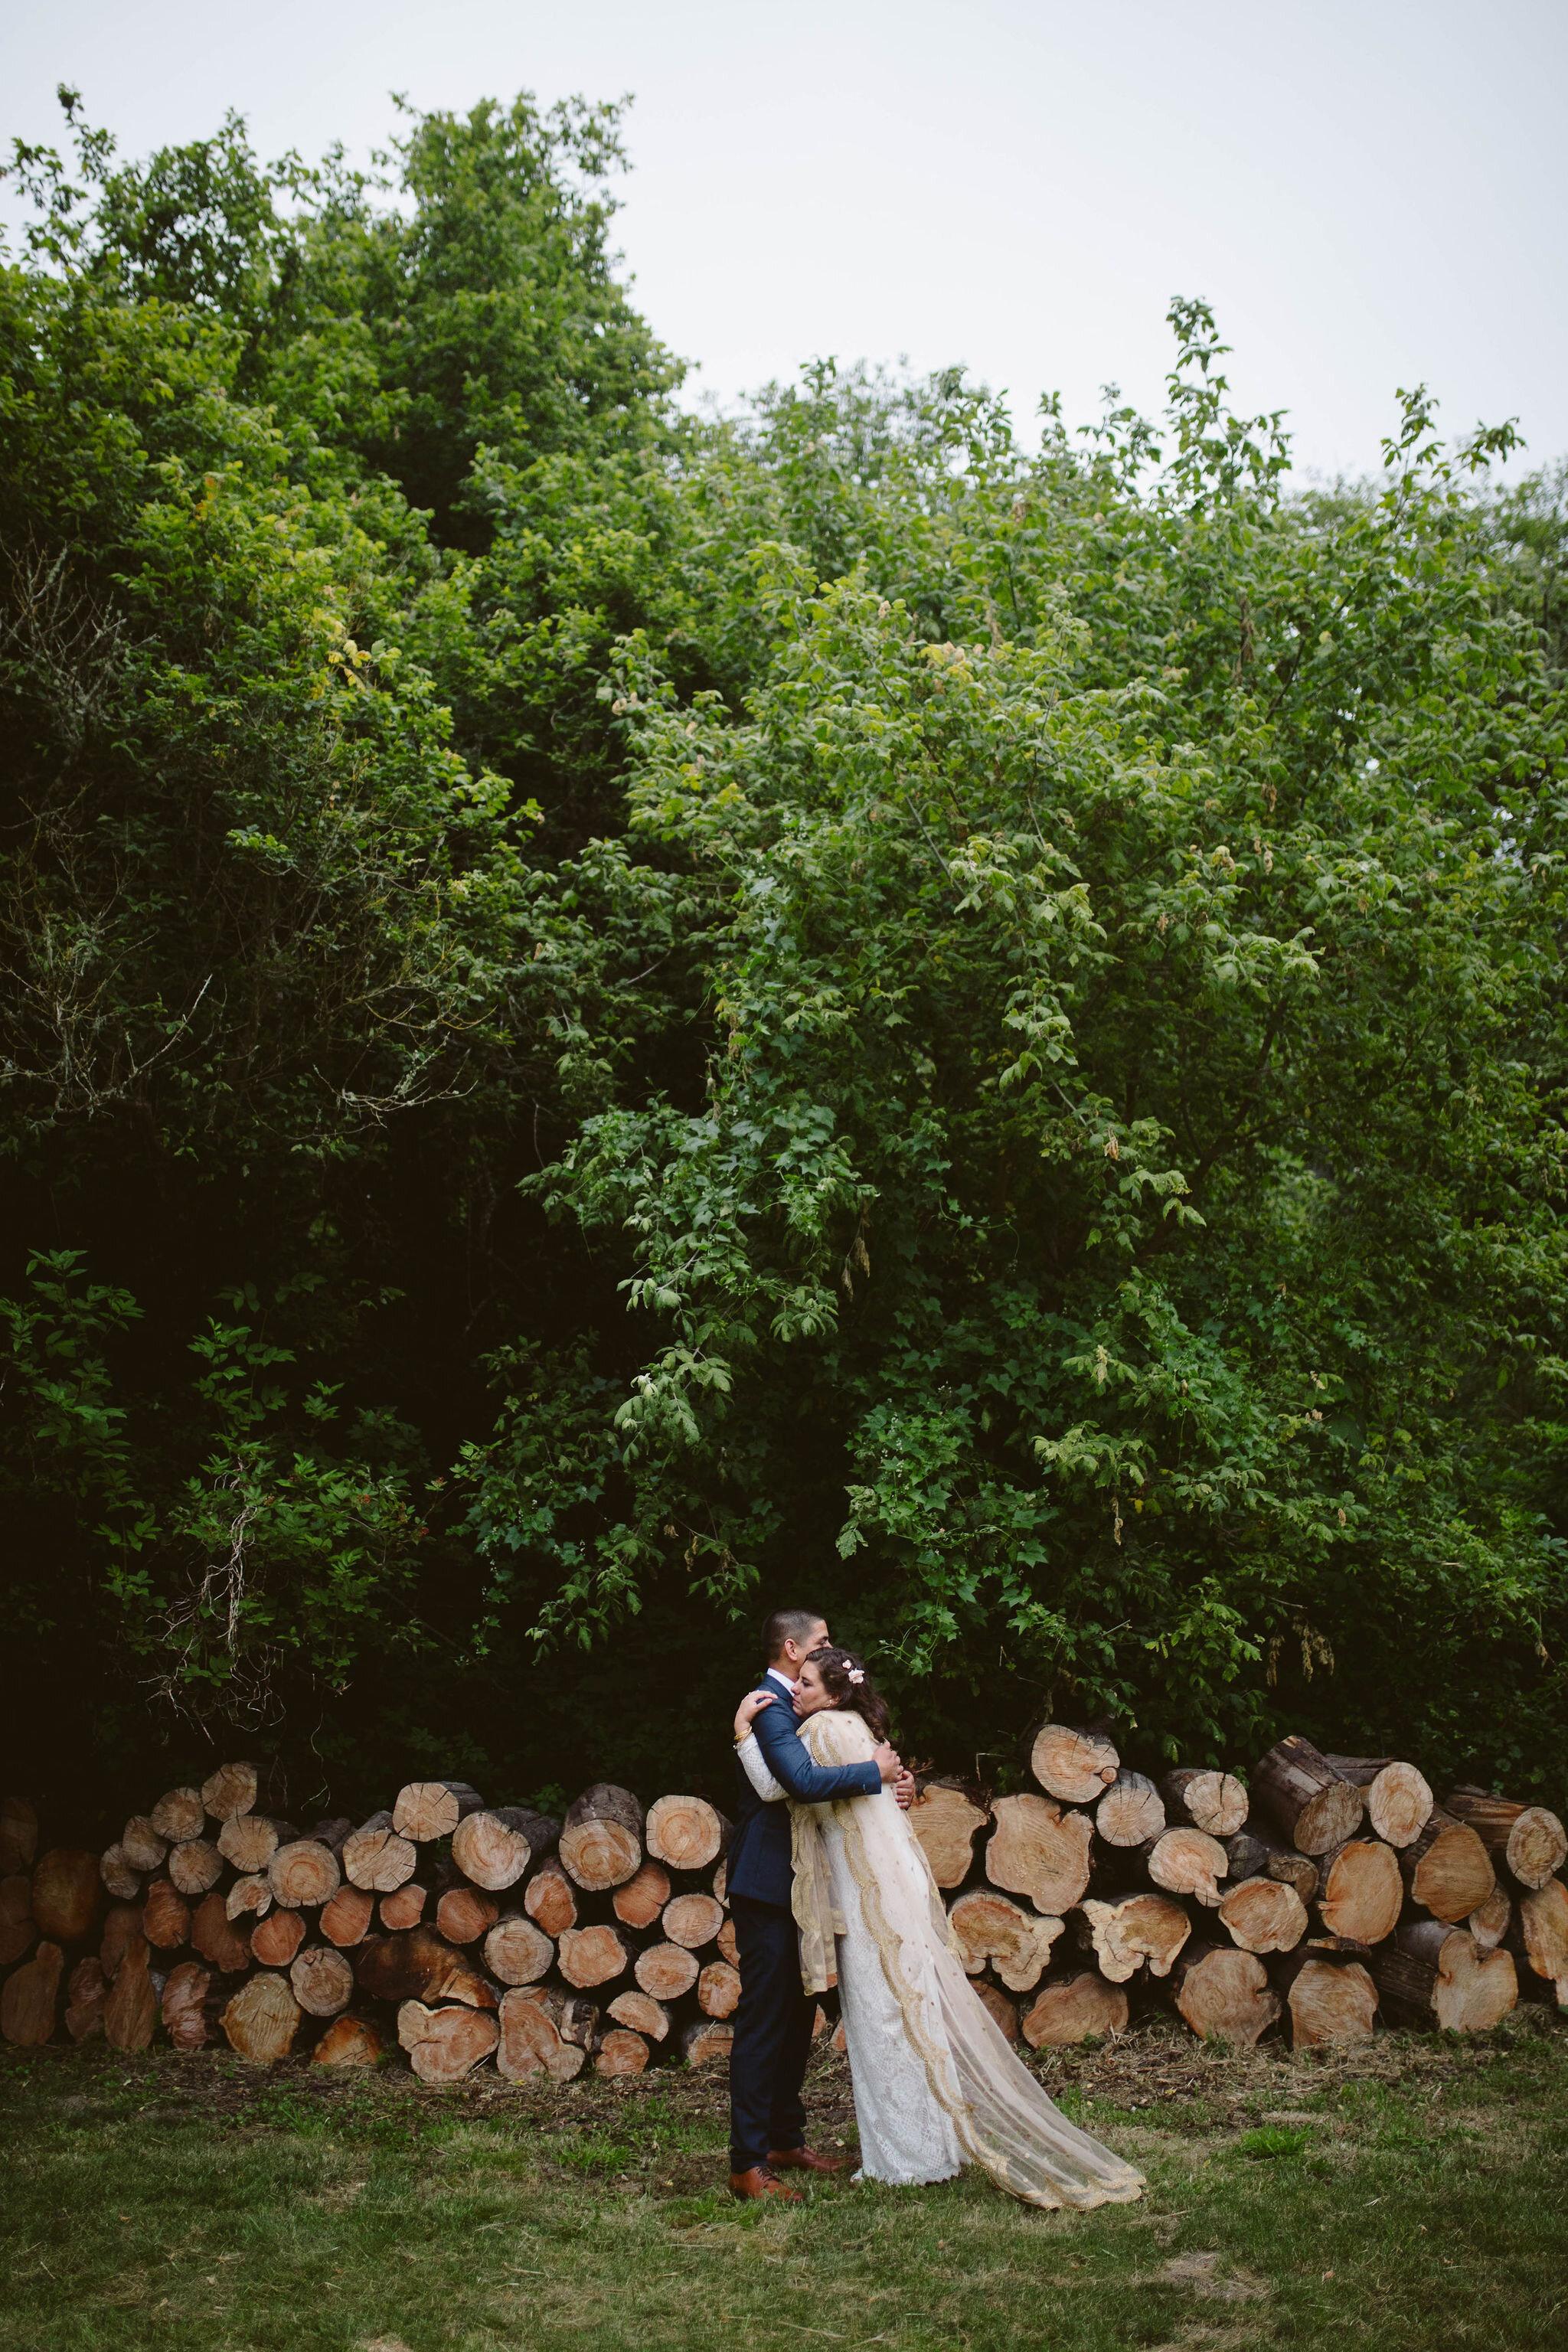 Venture-Retreat-Center-Wedding-Pescadero-Sat-Aaron-Pritam-The-Shalom-Imaginative-792.jpg